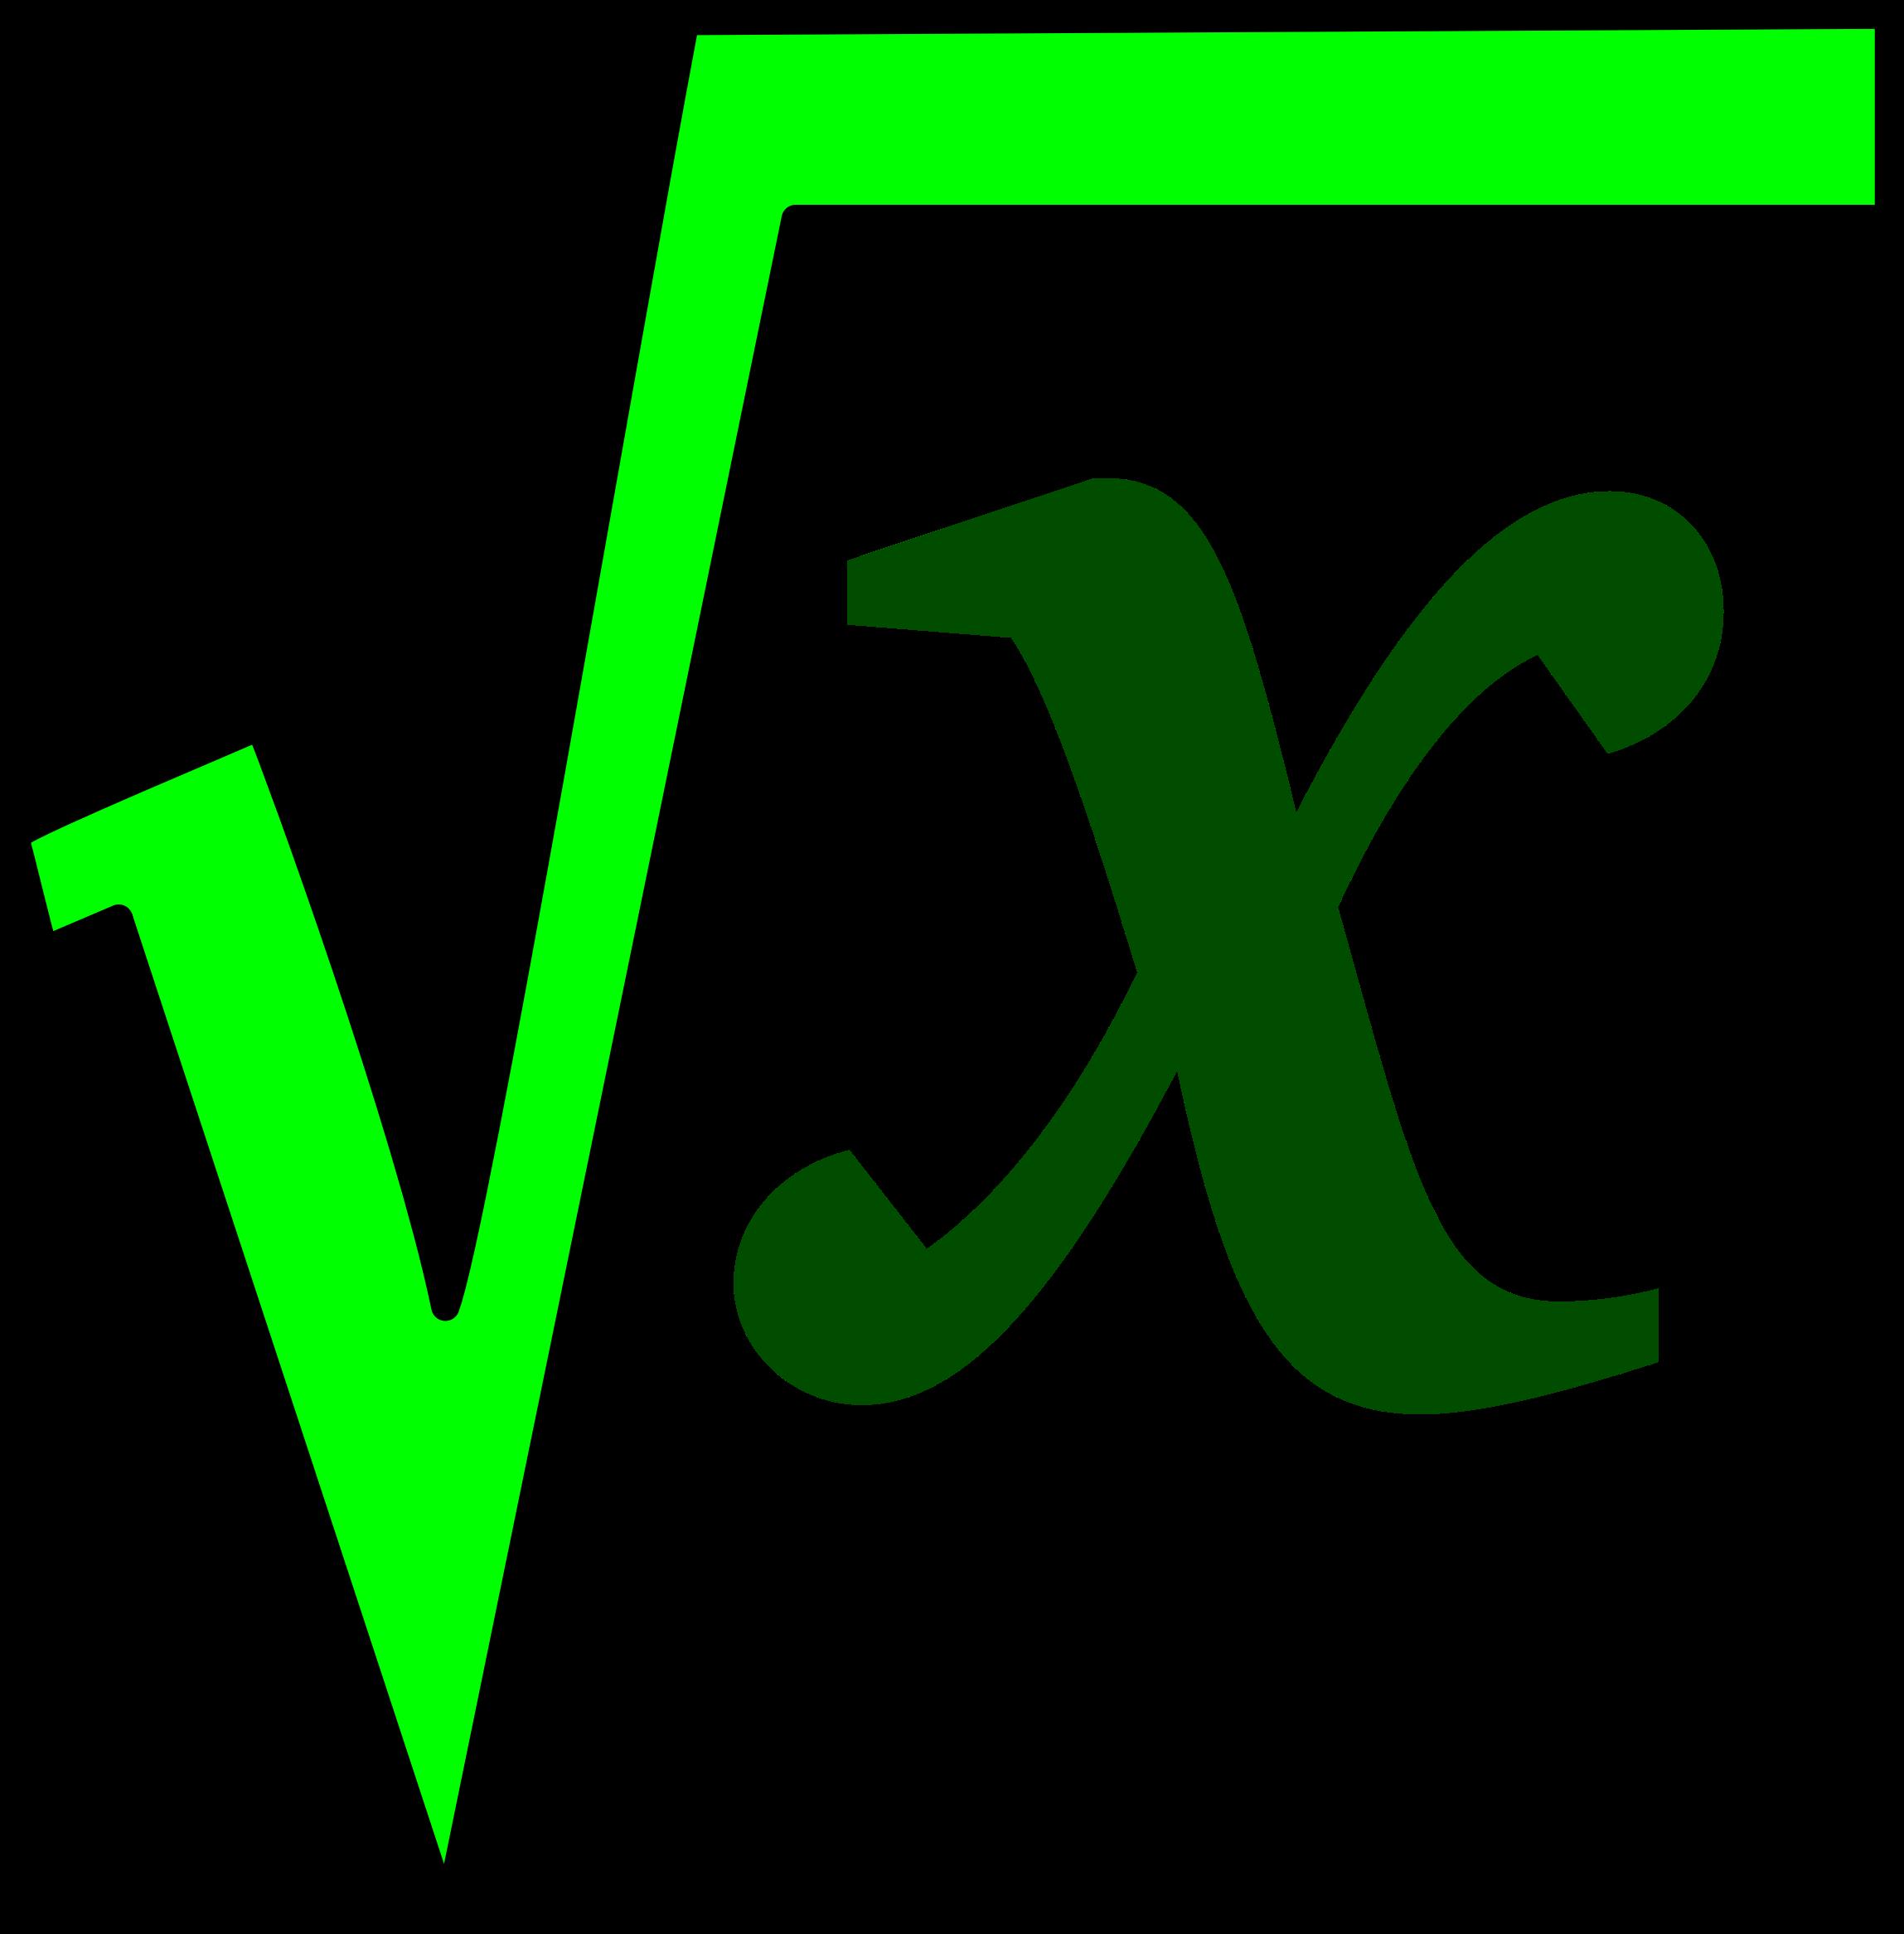 Geometry clipart mathematical model. Math sqrt big image